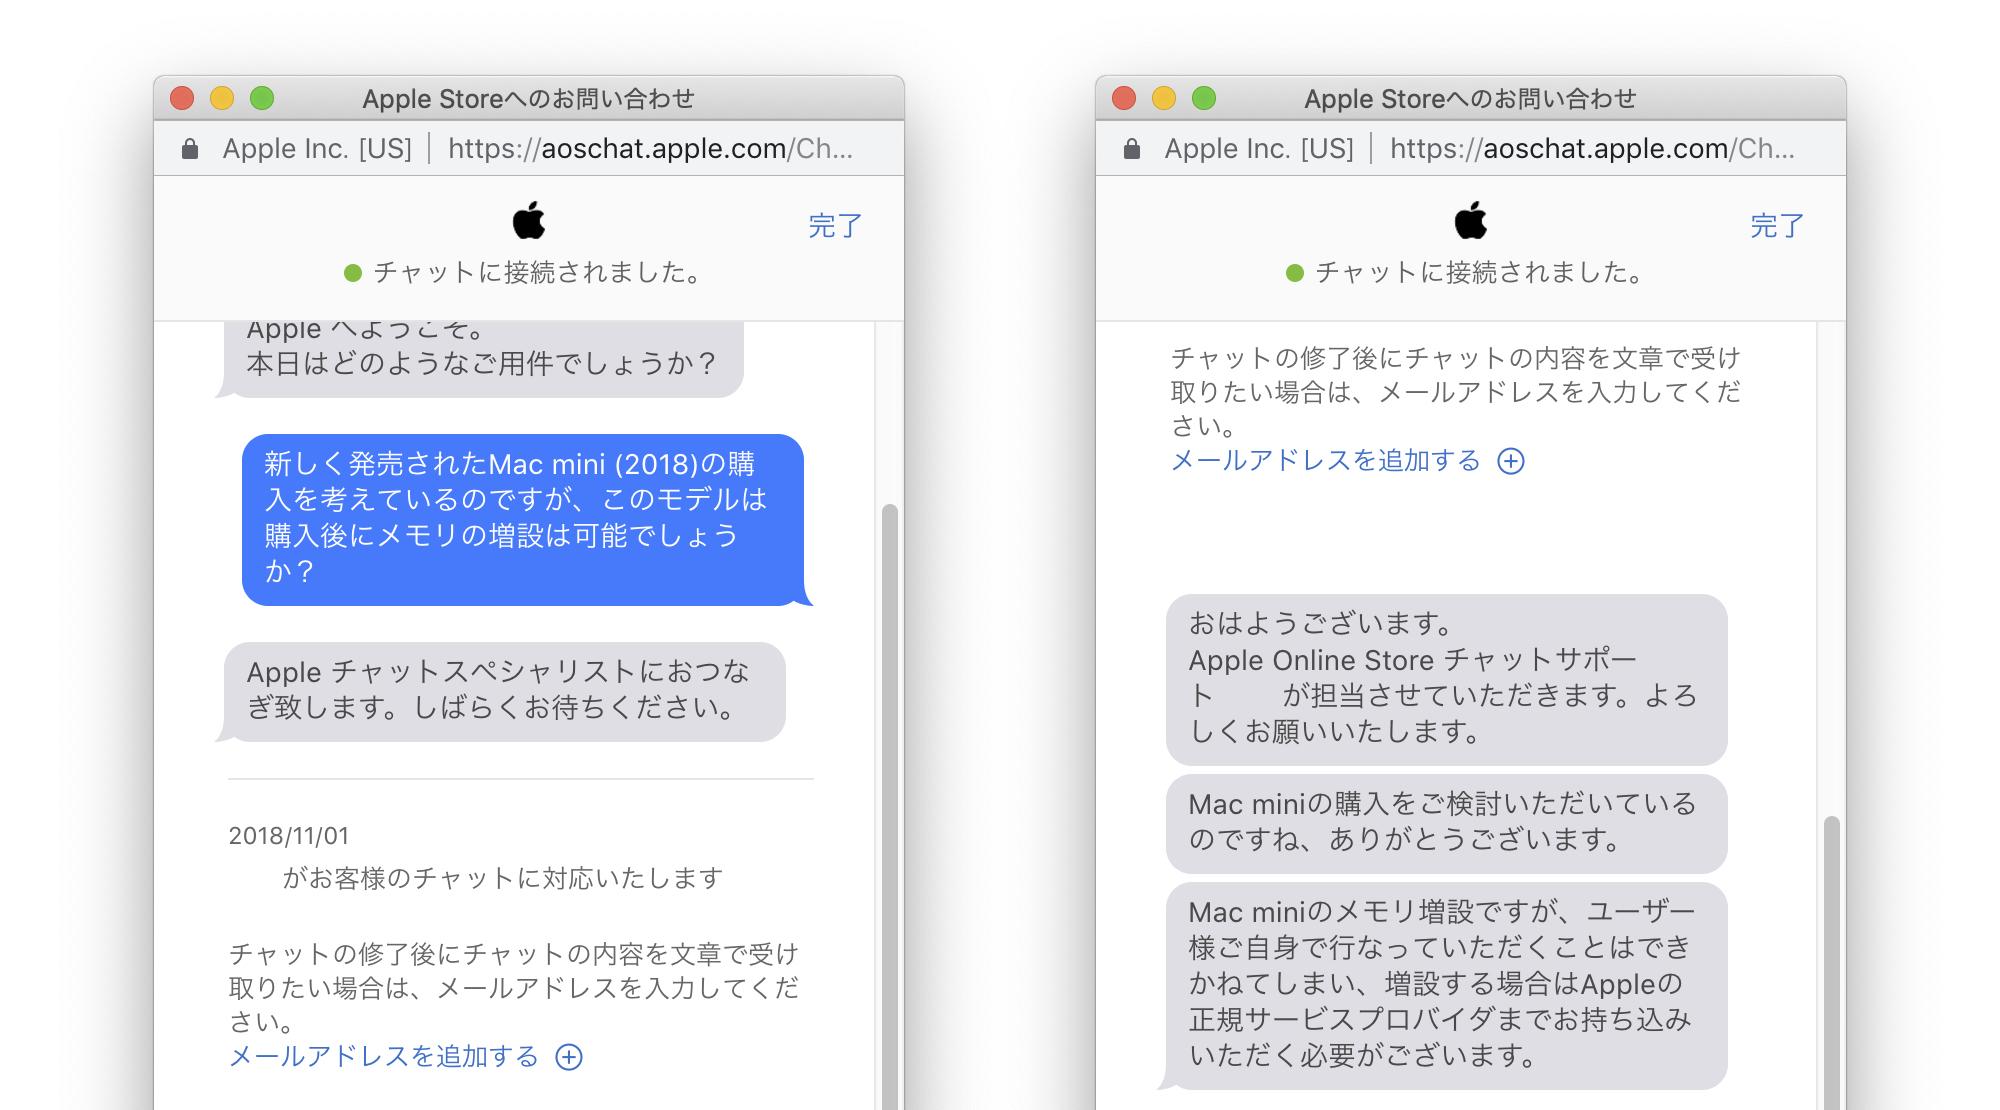 Mac mini (2018)のメモリ増設についての回答